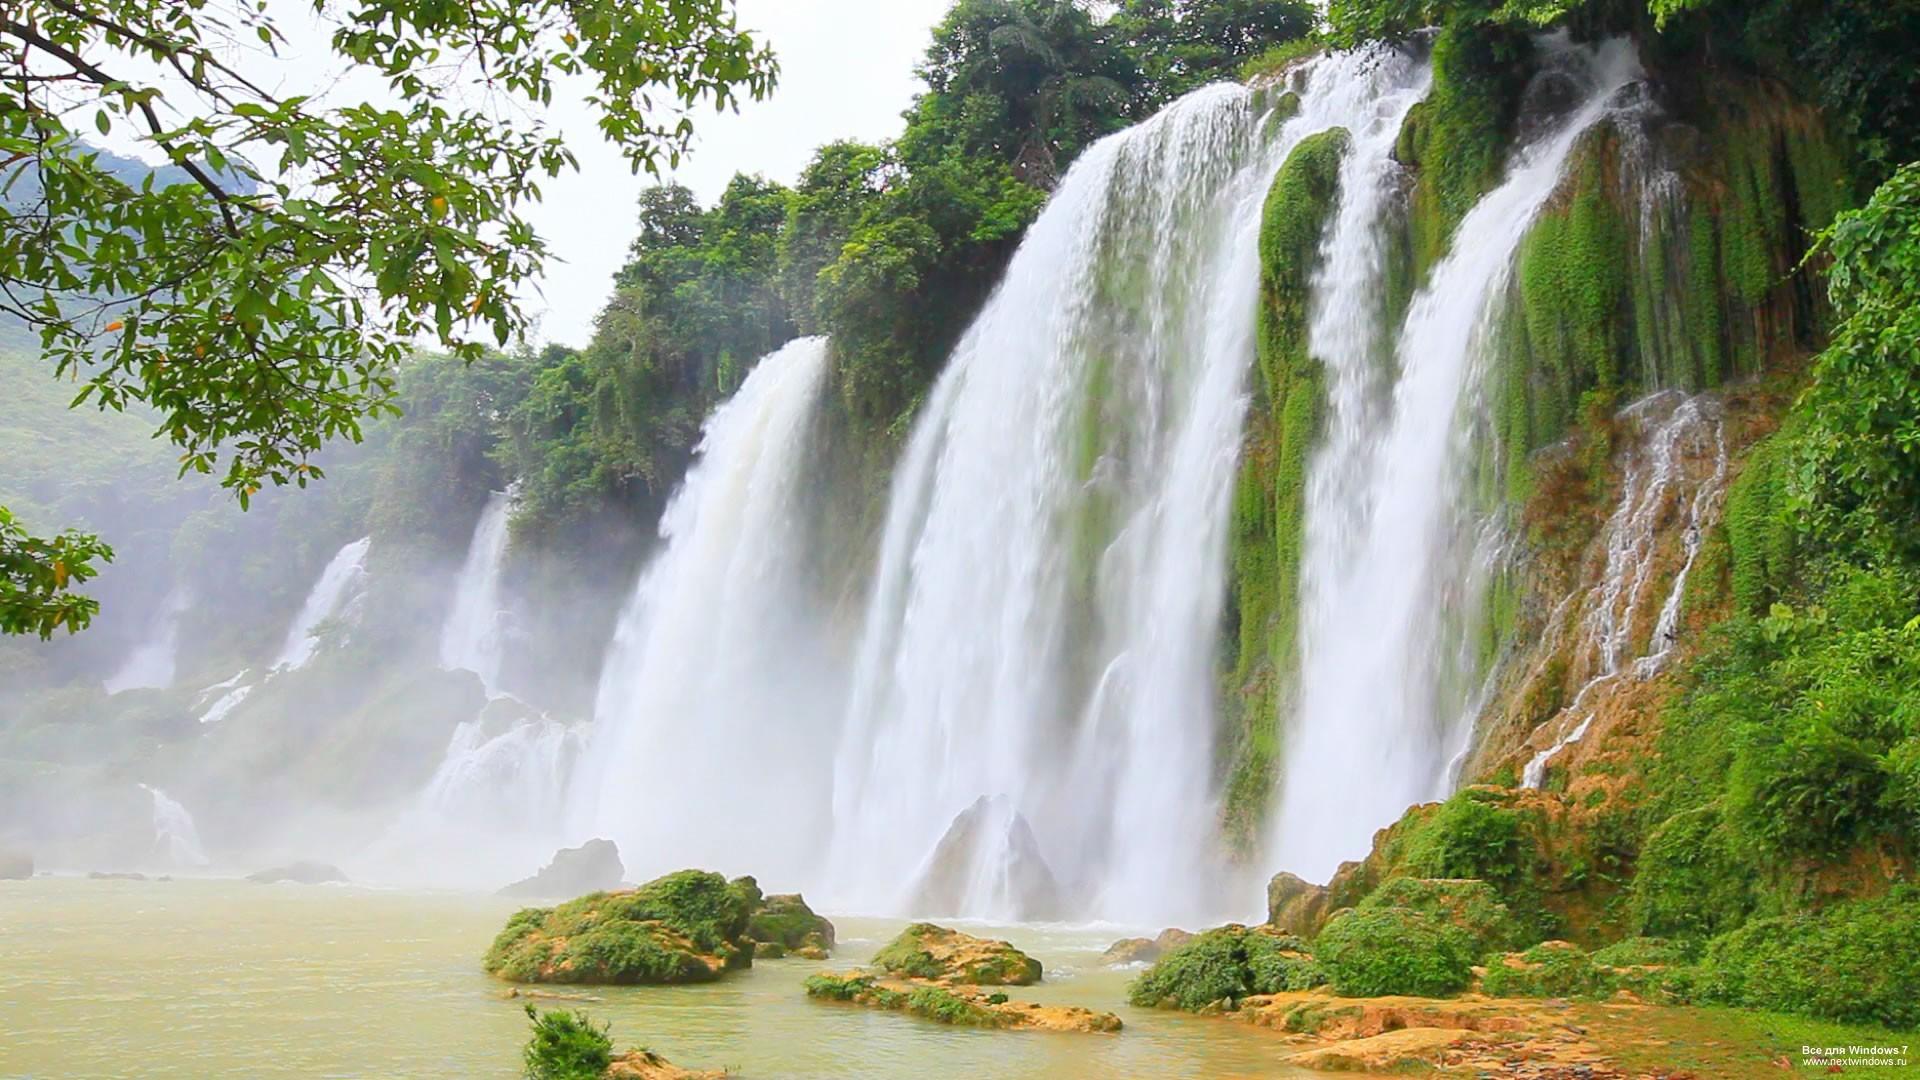 Screensavers Screensaver Themes Waterfall wallpapers HD free – 146663